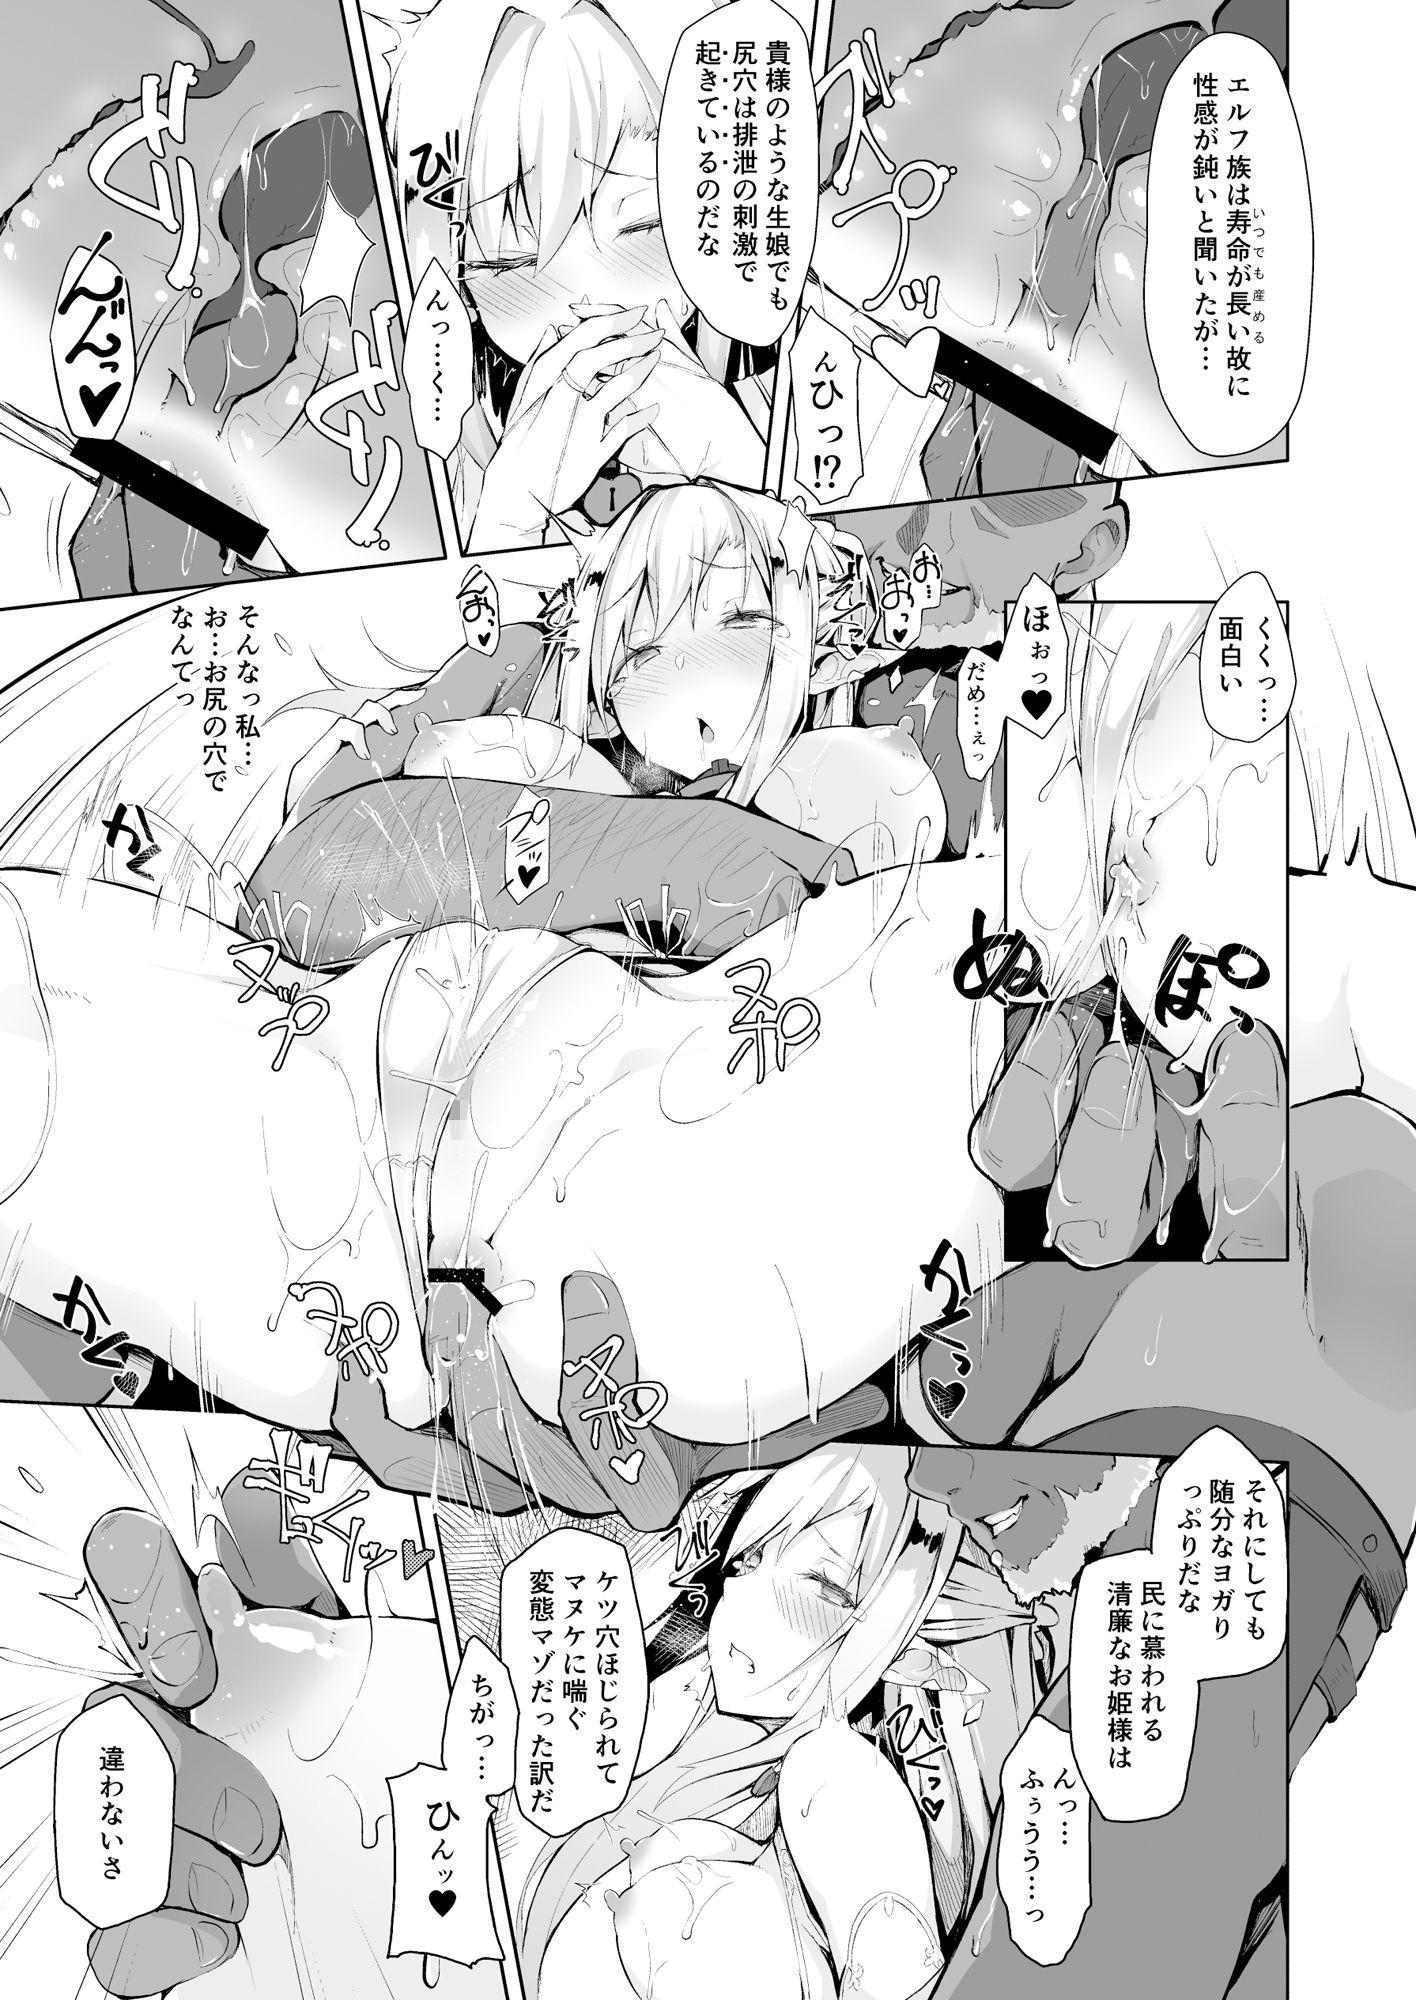 HONEY CAGE 【作品ネタバレ】